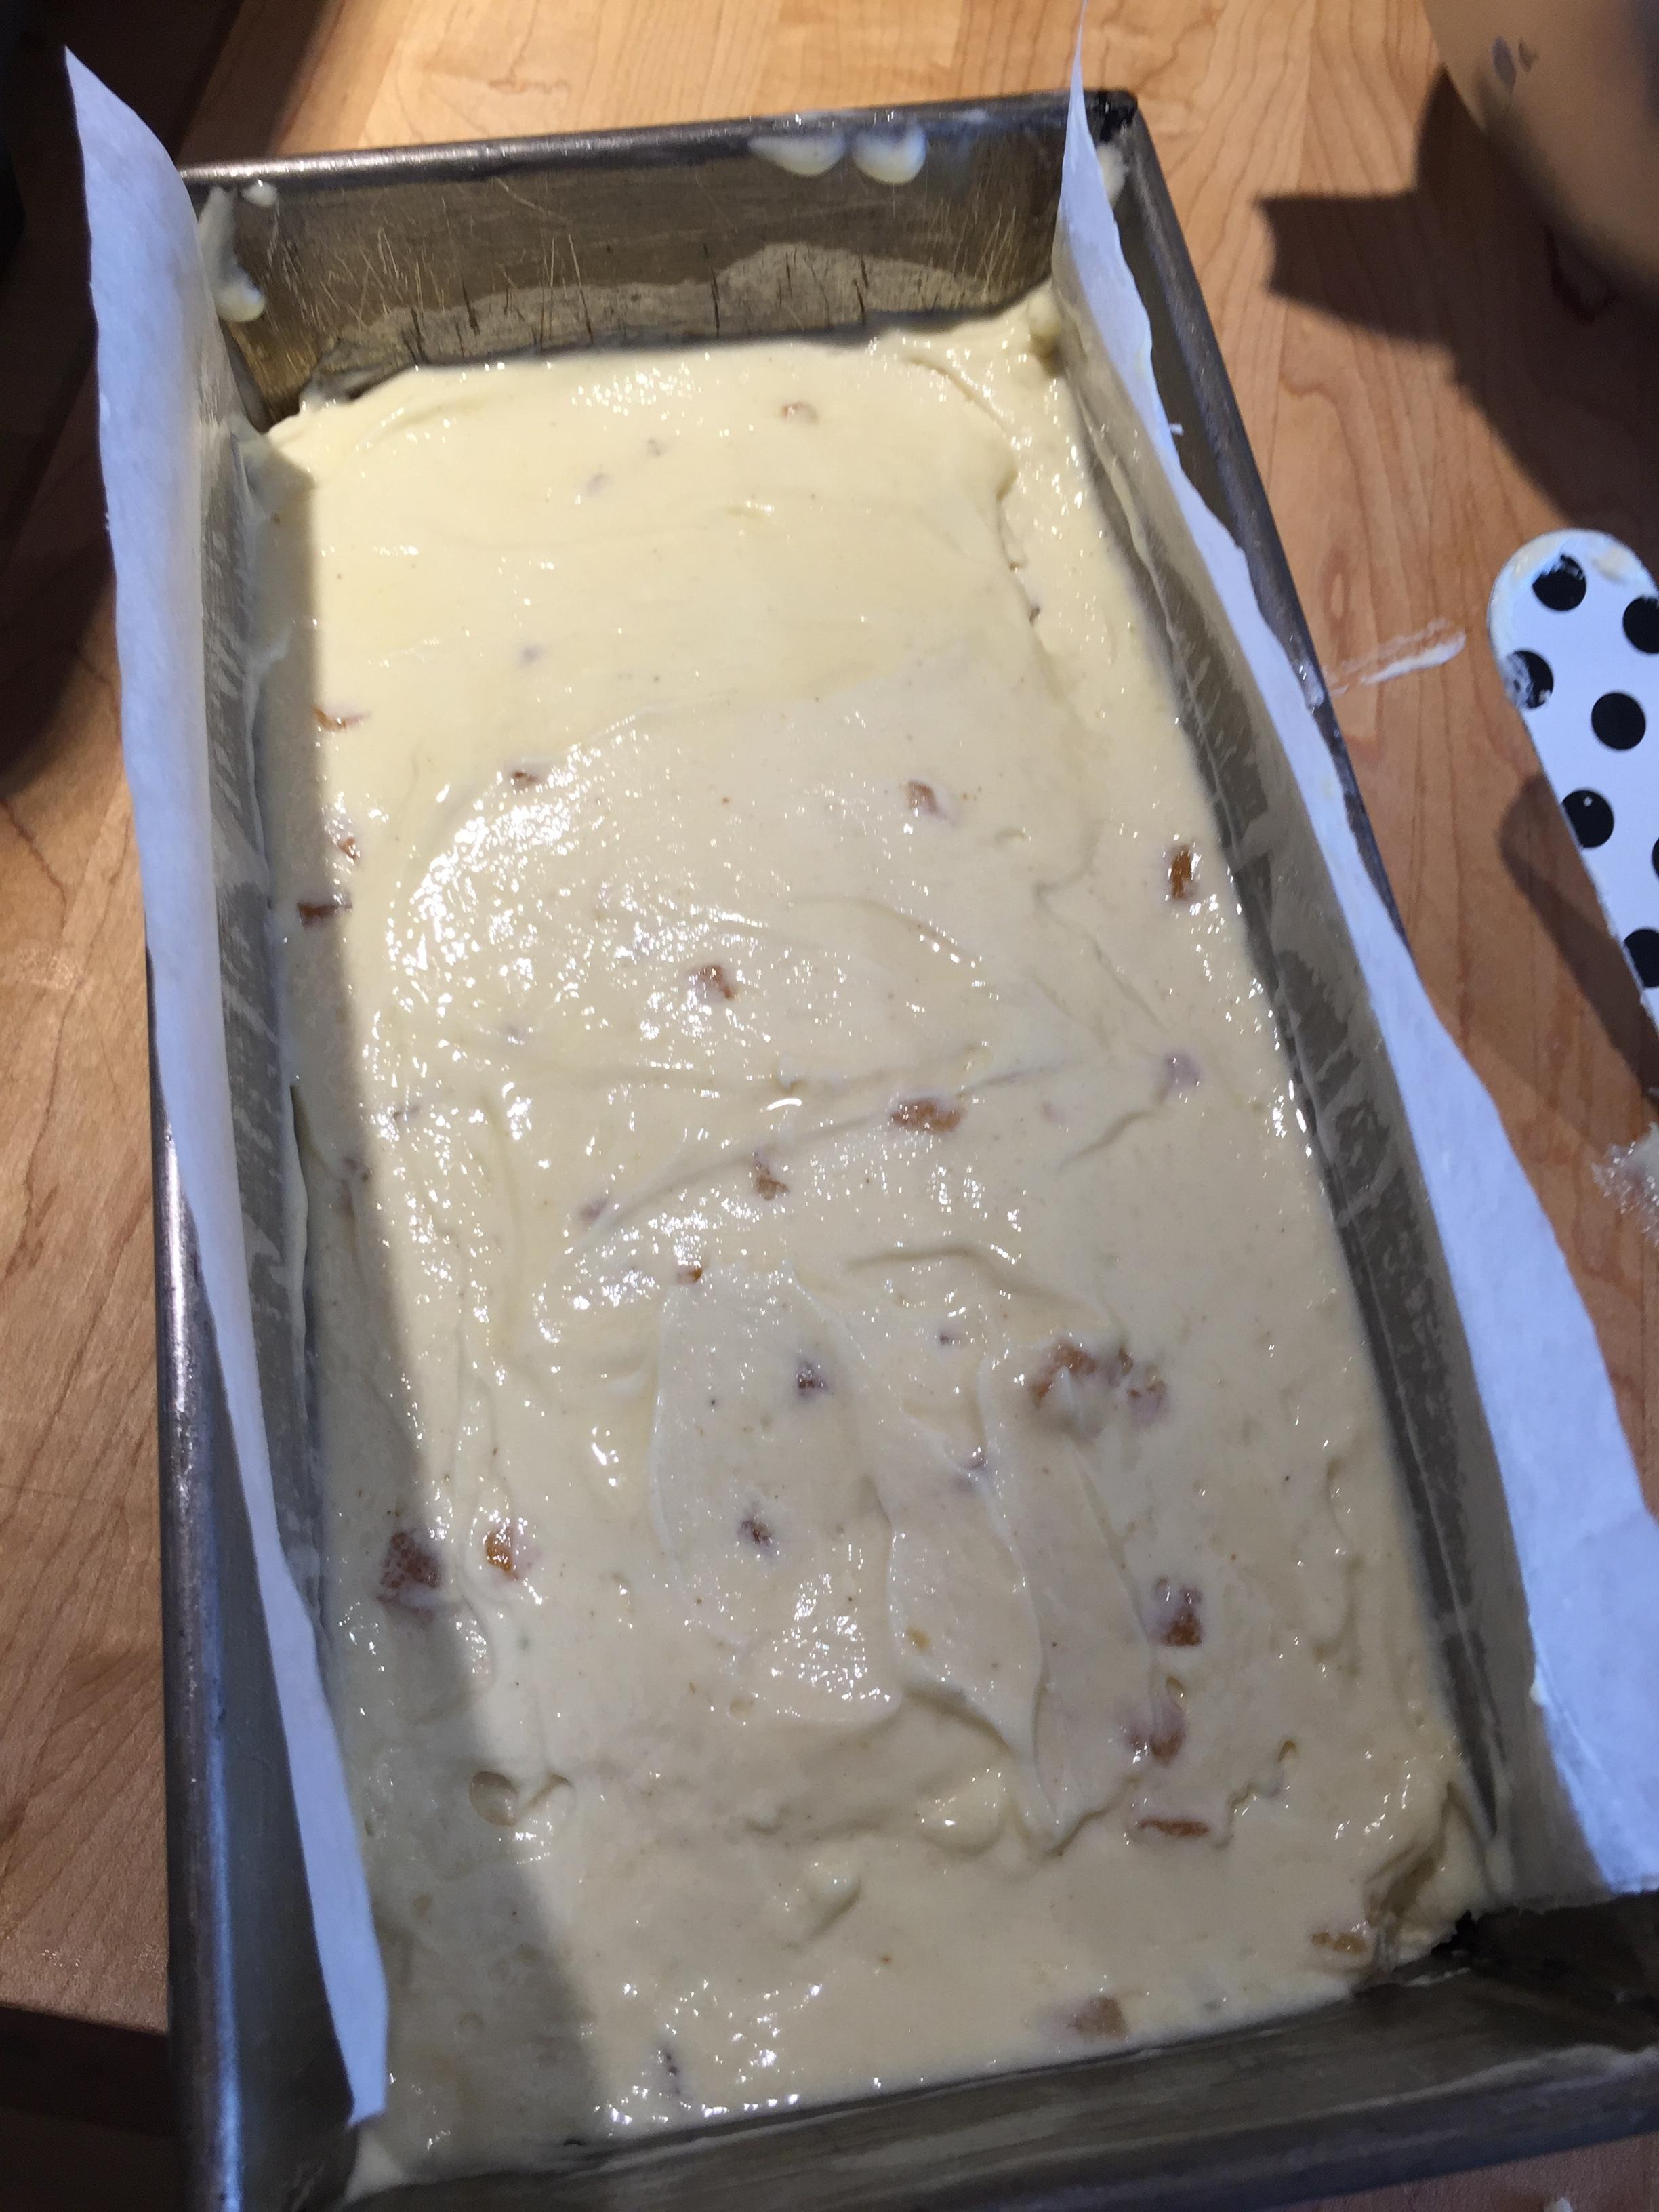 Batter in pan - ready to bake